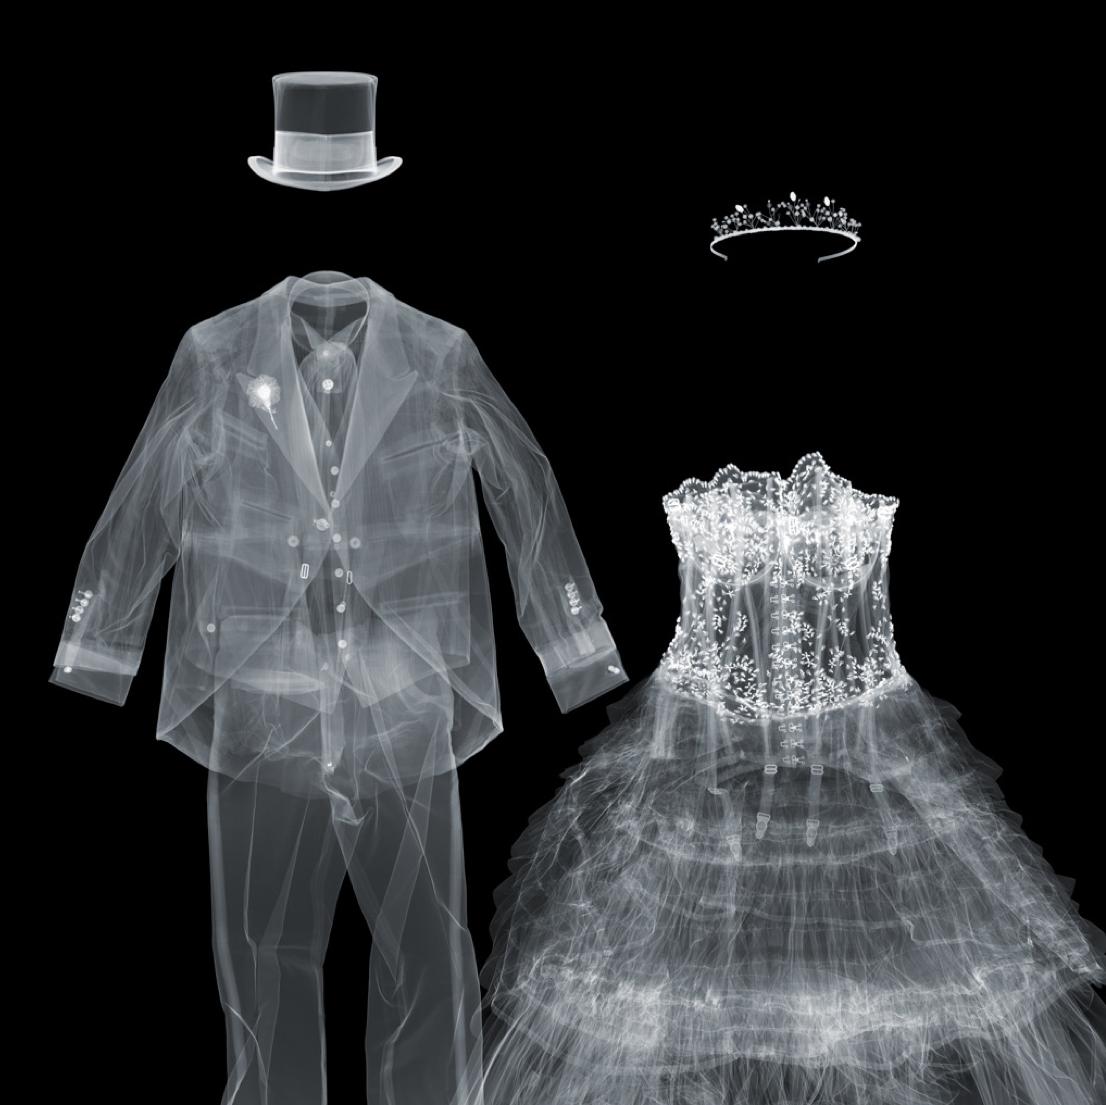 bride & groom / xray nick veasey